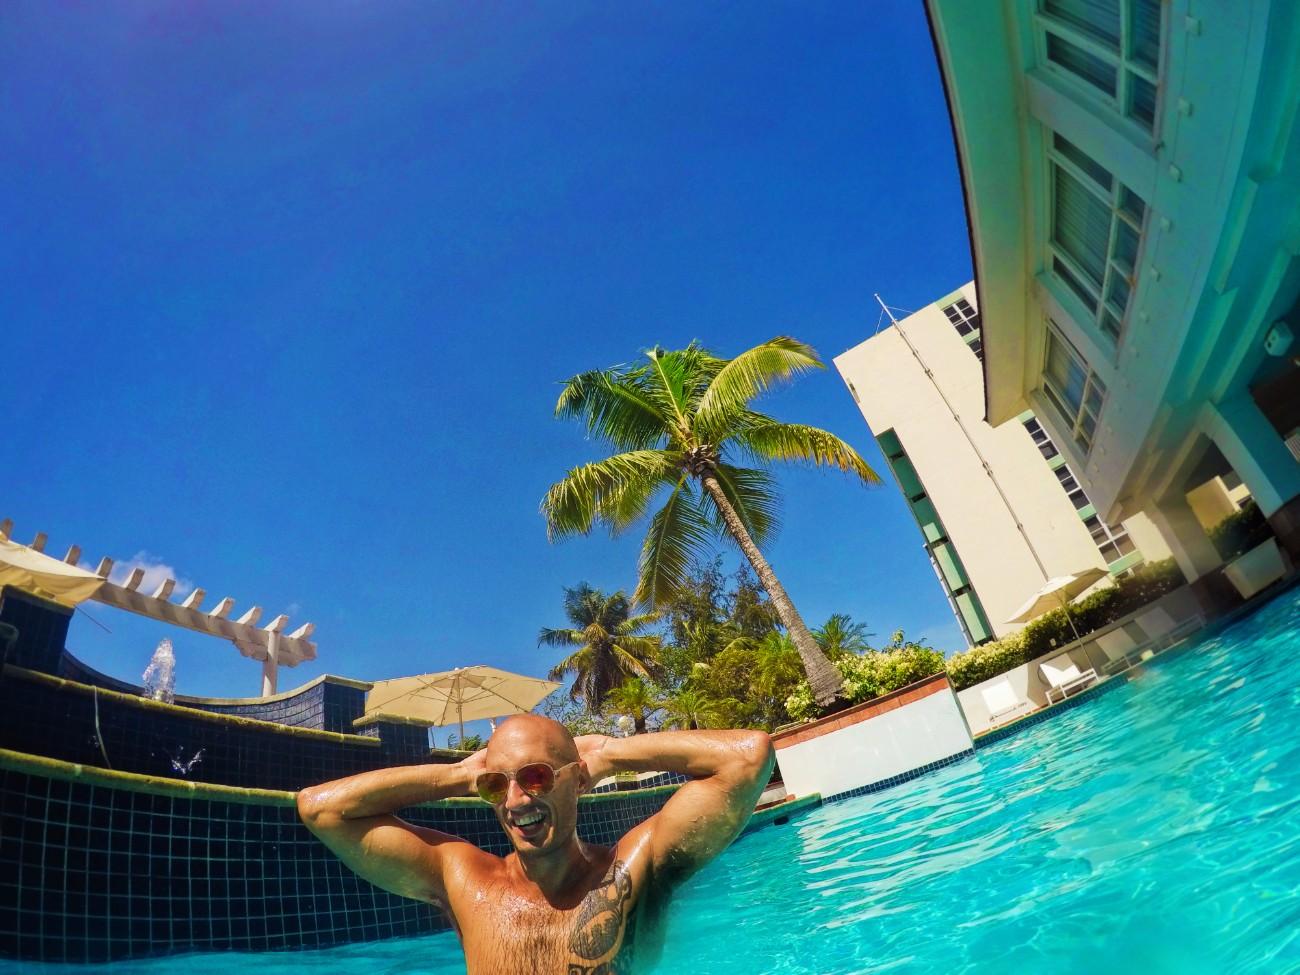 Rob-Taylor-in-Pool-at-Condado-Plaza-Hilton-San-Juan-Puerto-Rico-1.jpg